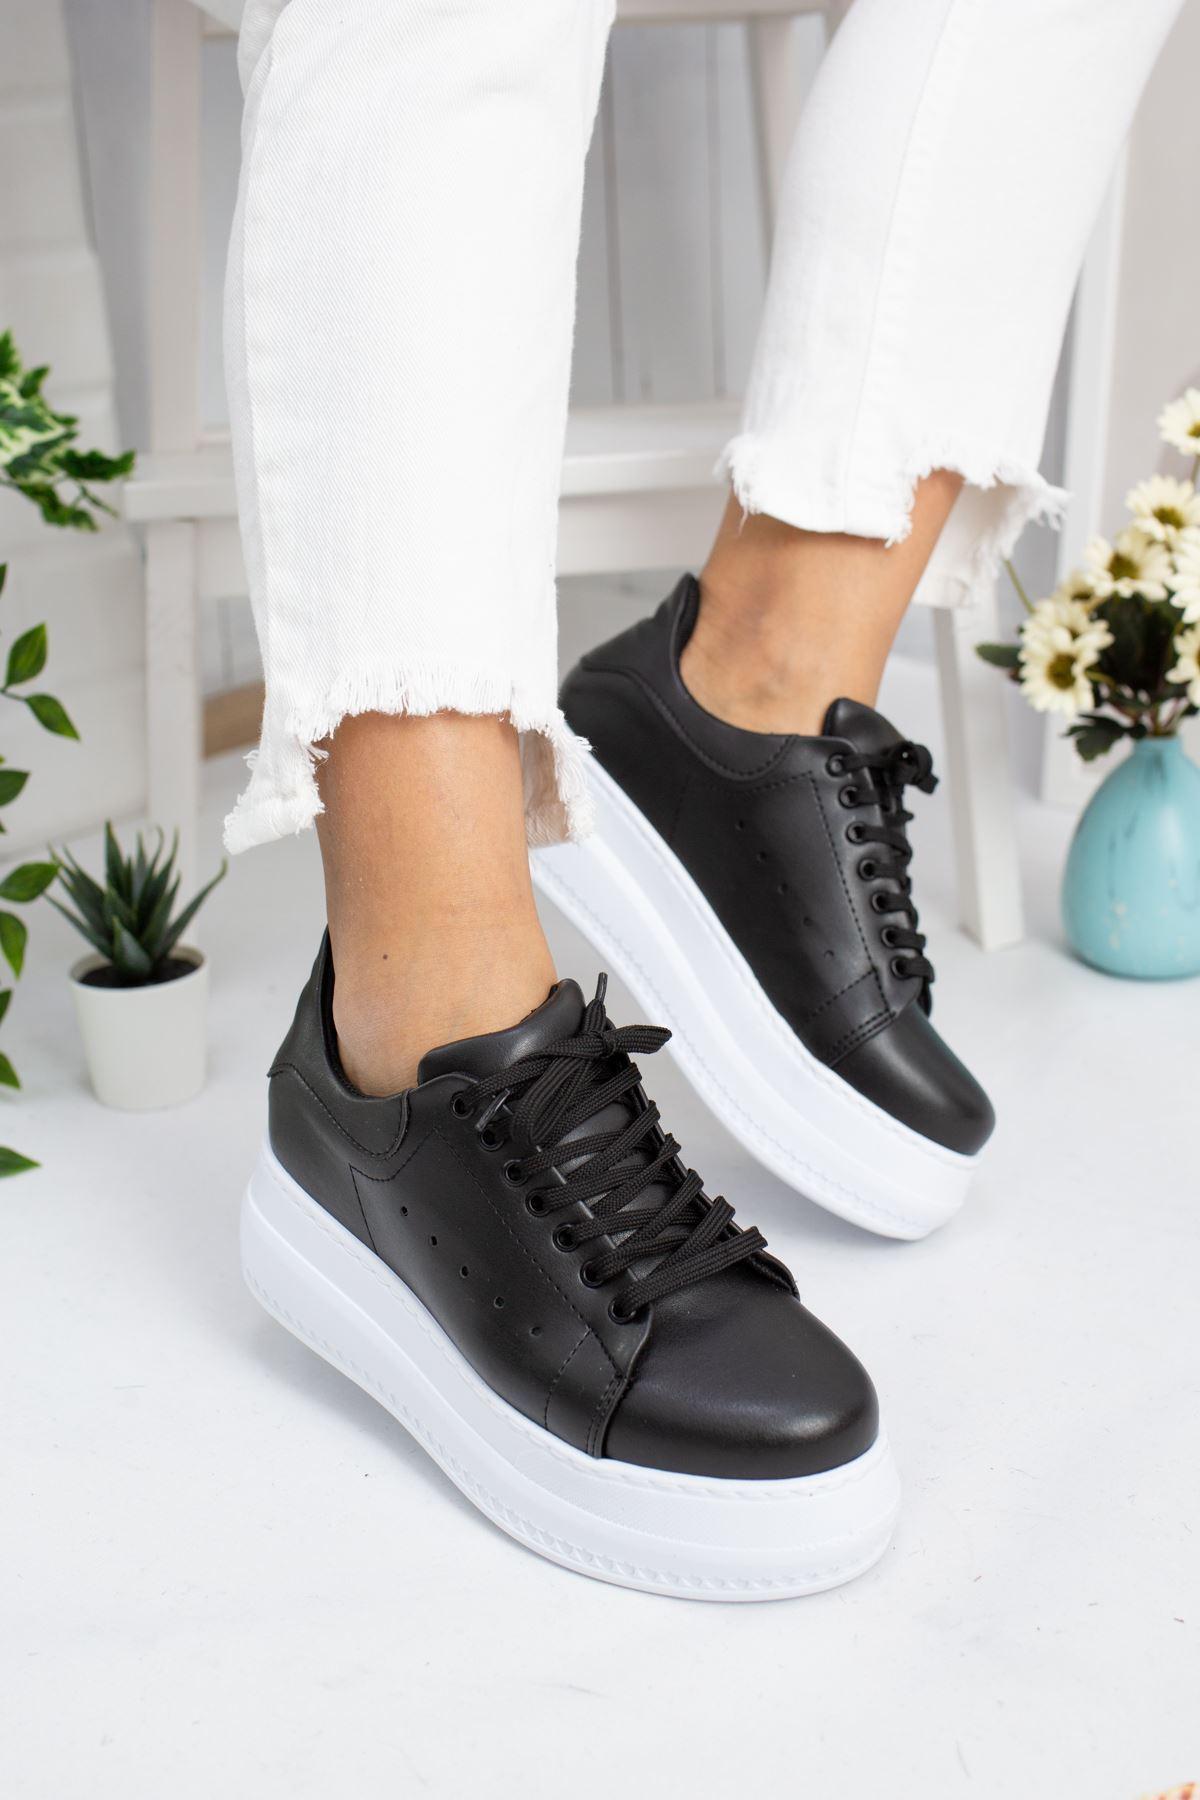 Tito Siyah Cilt Kadın Spor Ayakkabı